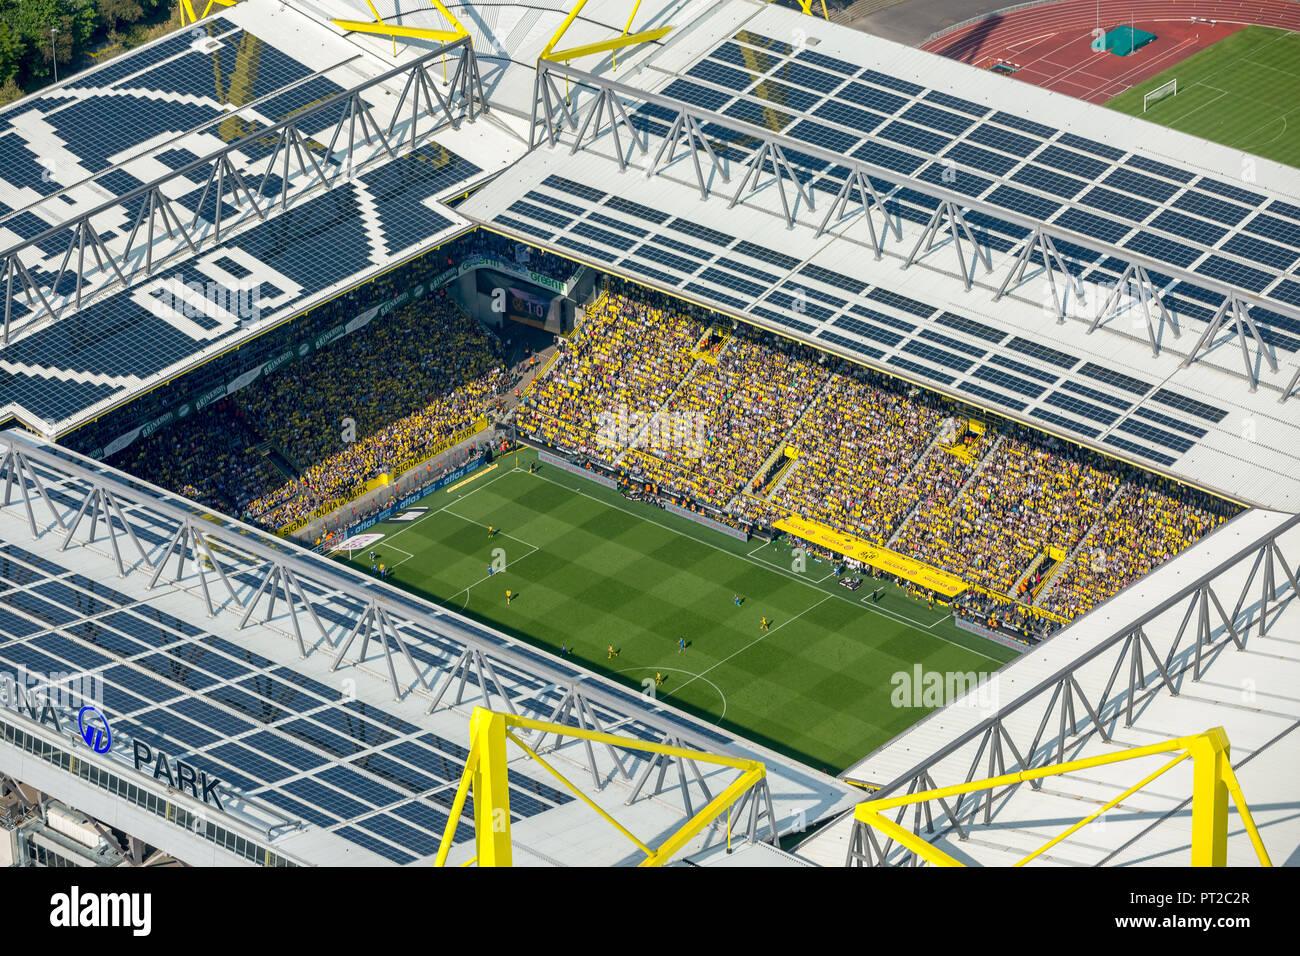 BVB vs. TSG Hoffenheim, Signal Iduna Park, BVB Stadium, Westfalenstadion, Bundesliga Stadium, Dortmund, Ruhr Area, North Rhine-Westphalia, Germany, Europe - Stock Image